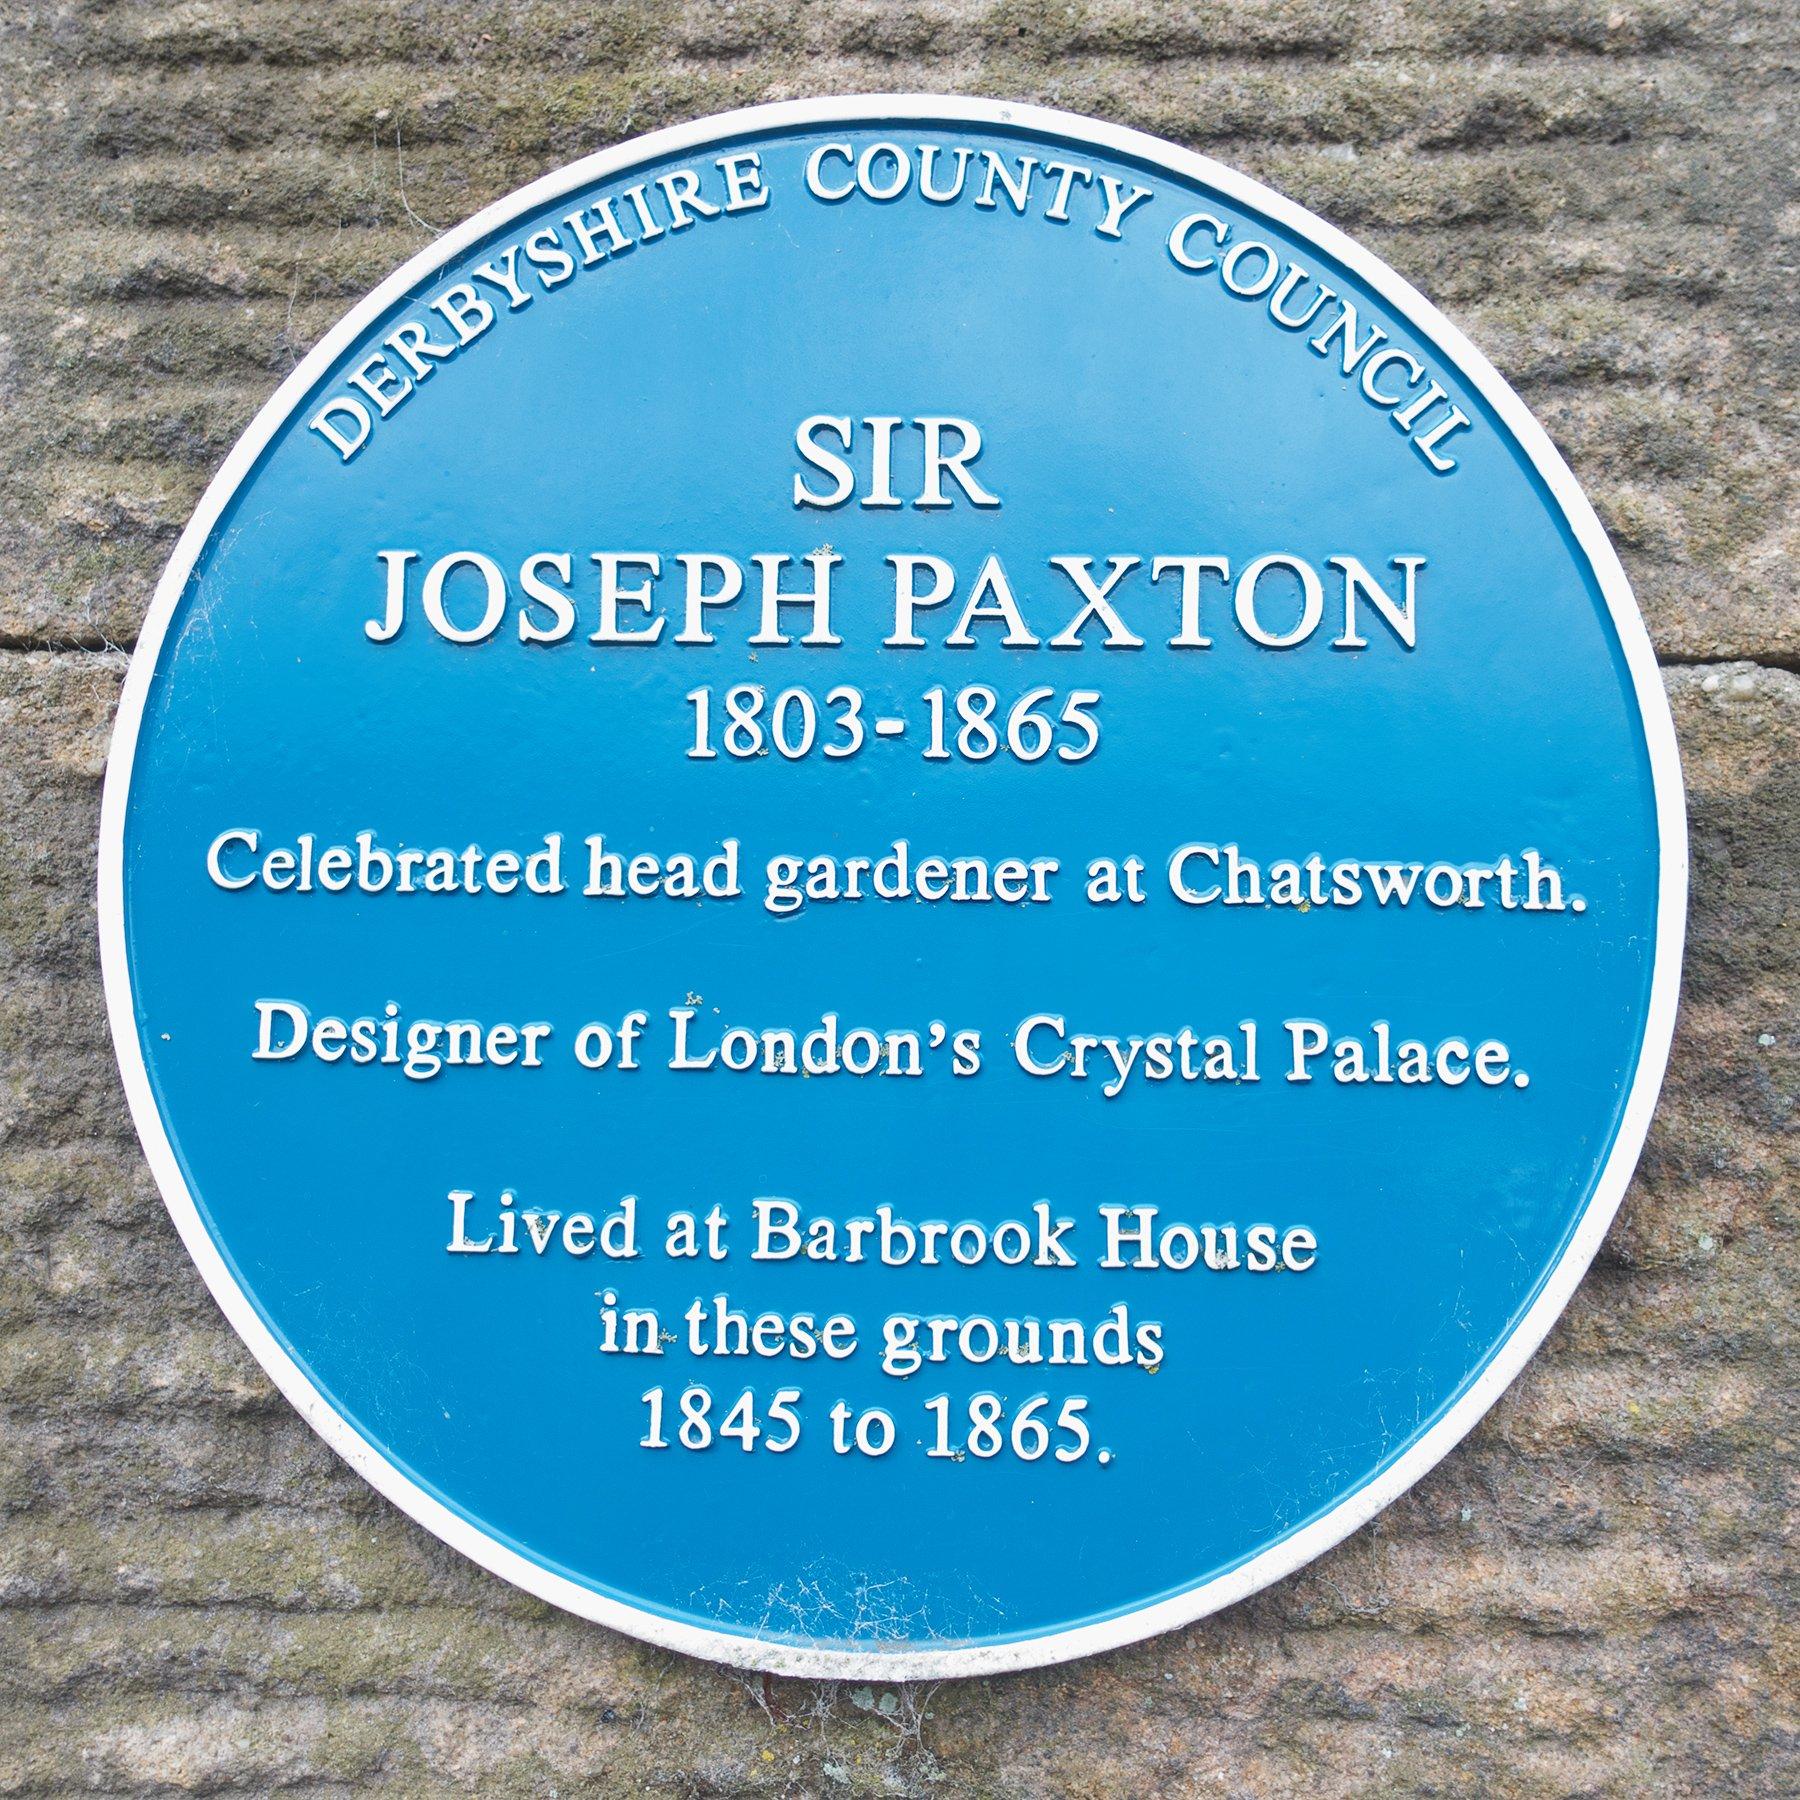 Sir Joseph Paxton plaque